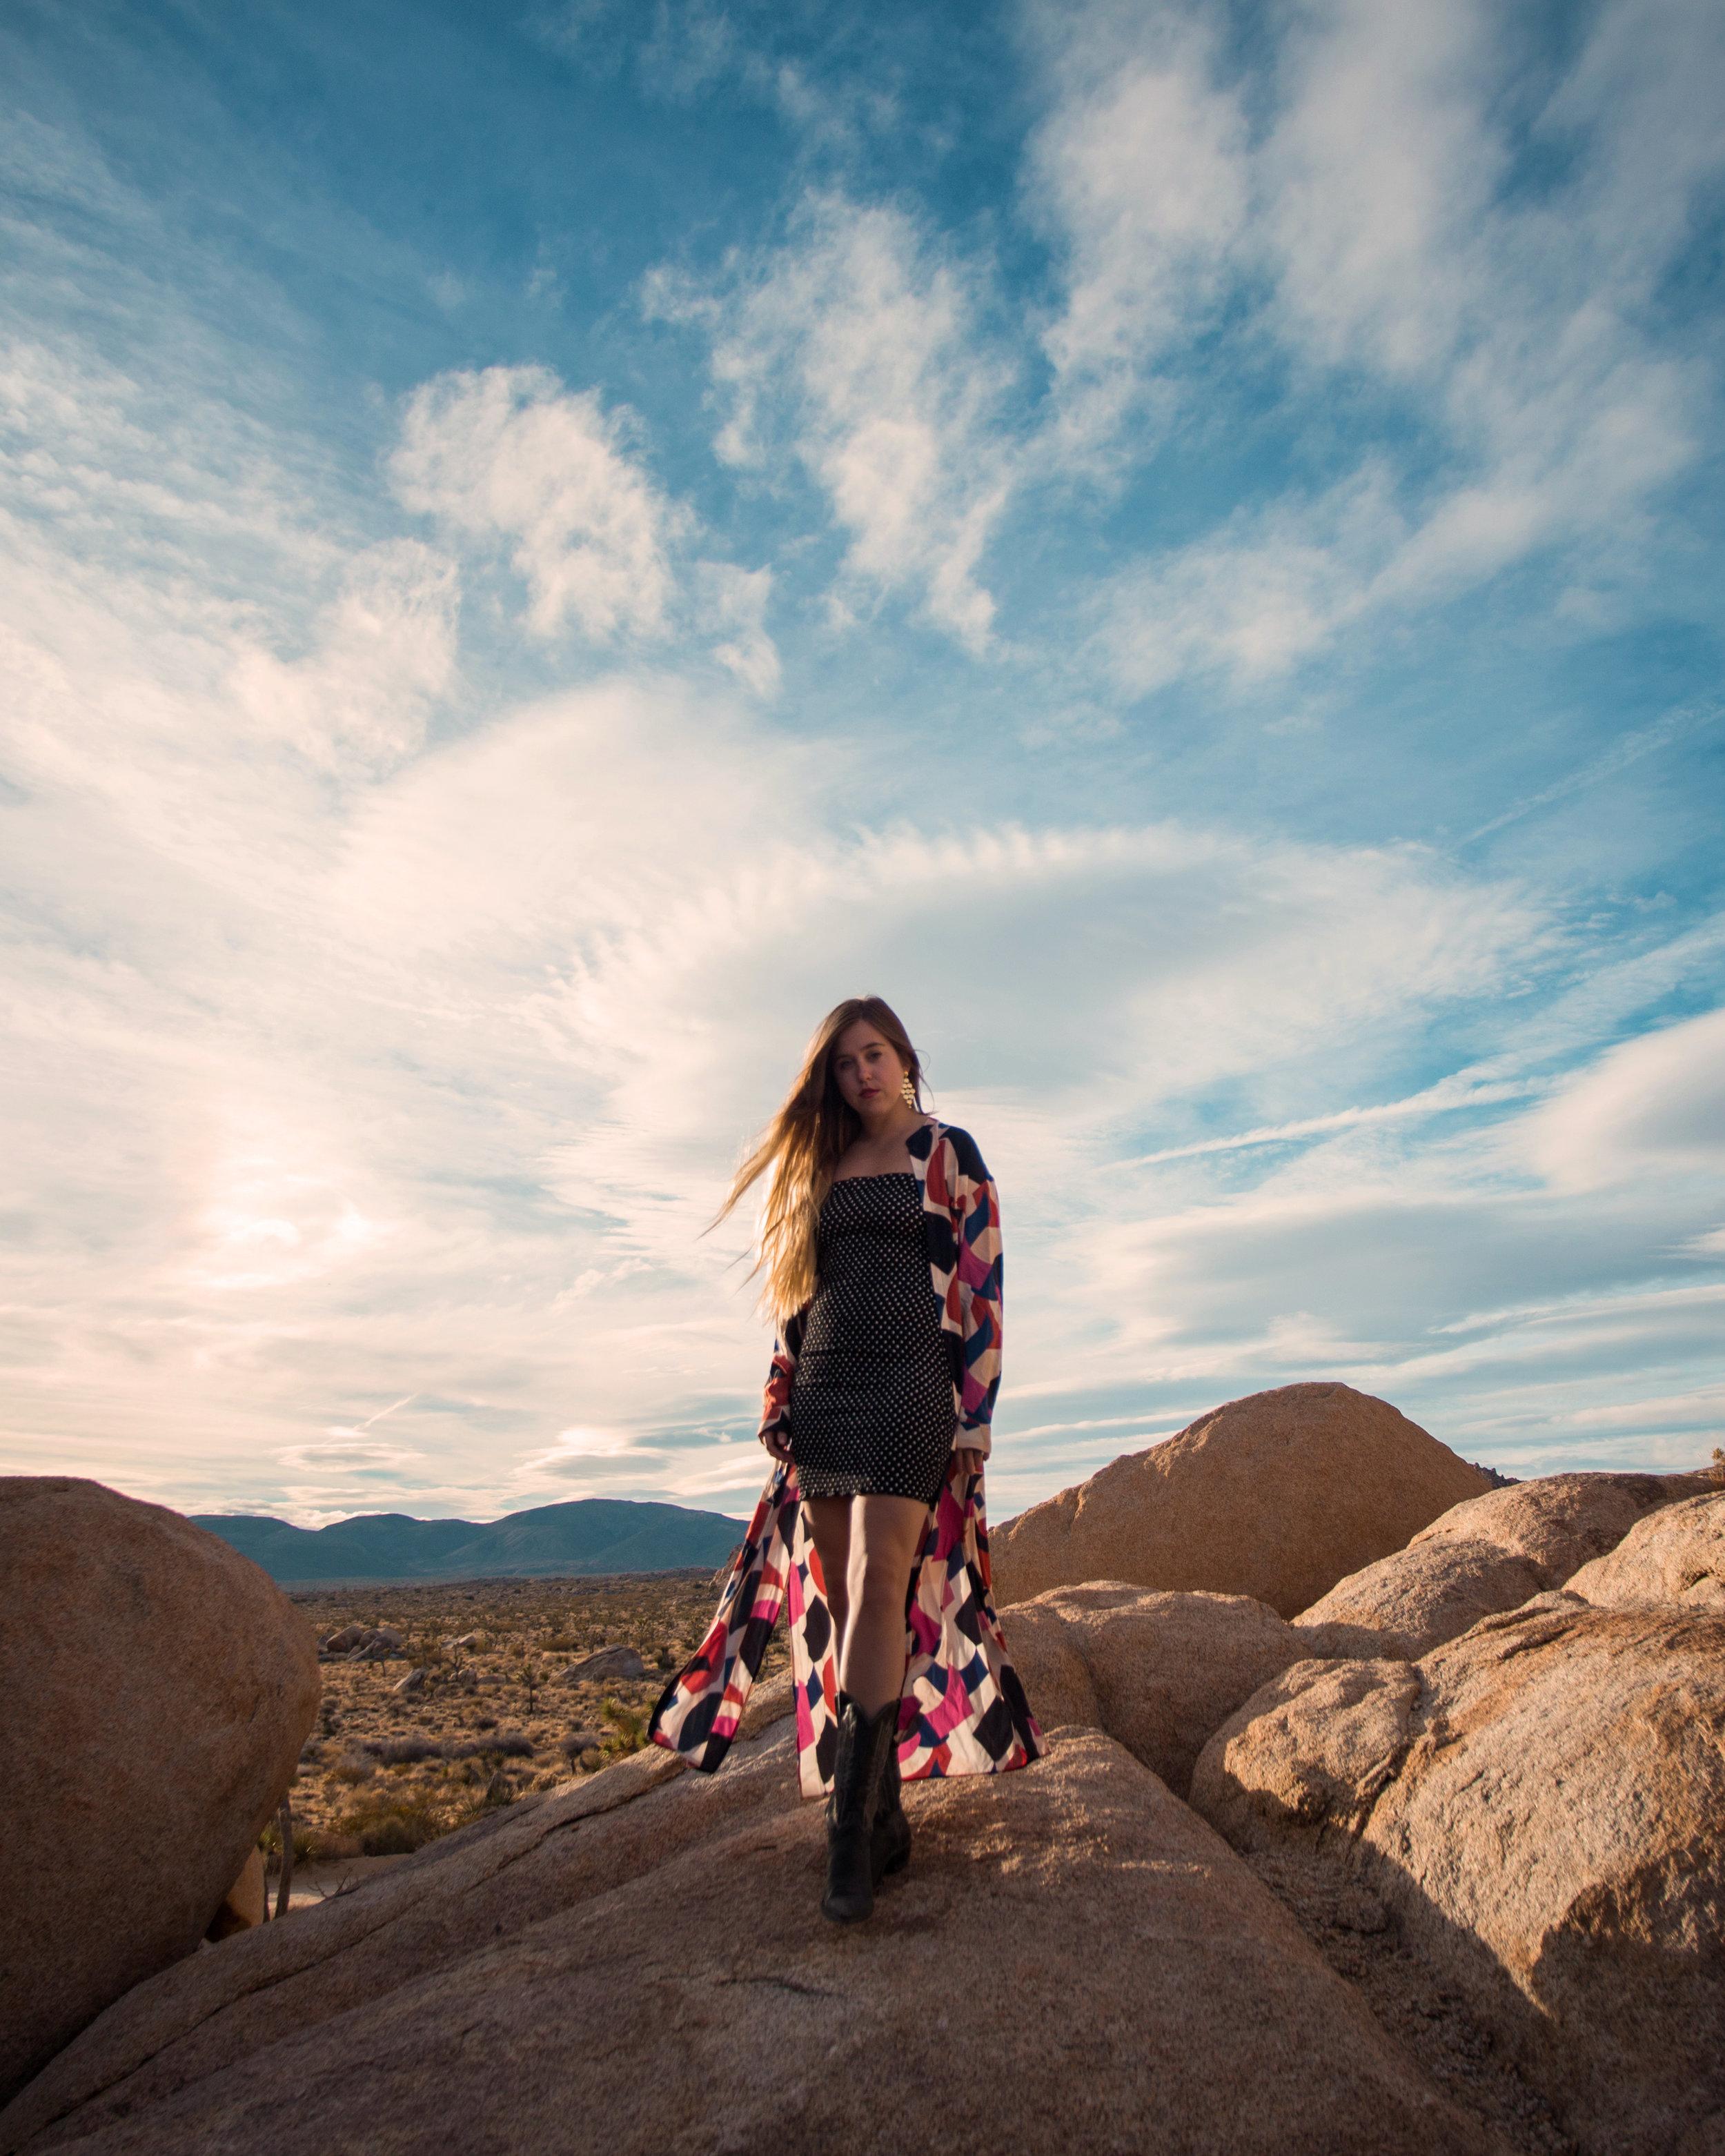 AstroBandit_JordanRose_GoJane_FreePeople_CowboyBoots_FarylRobin_Desert_Sunset_Spring_2018_MixingPrints_4.jpg